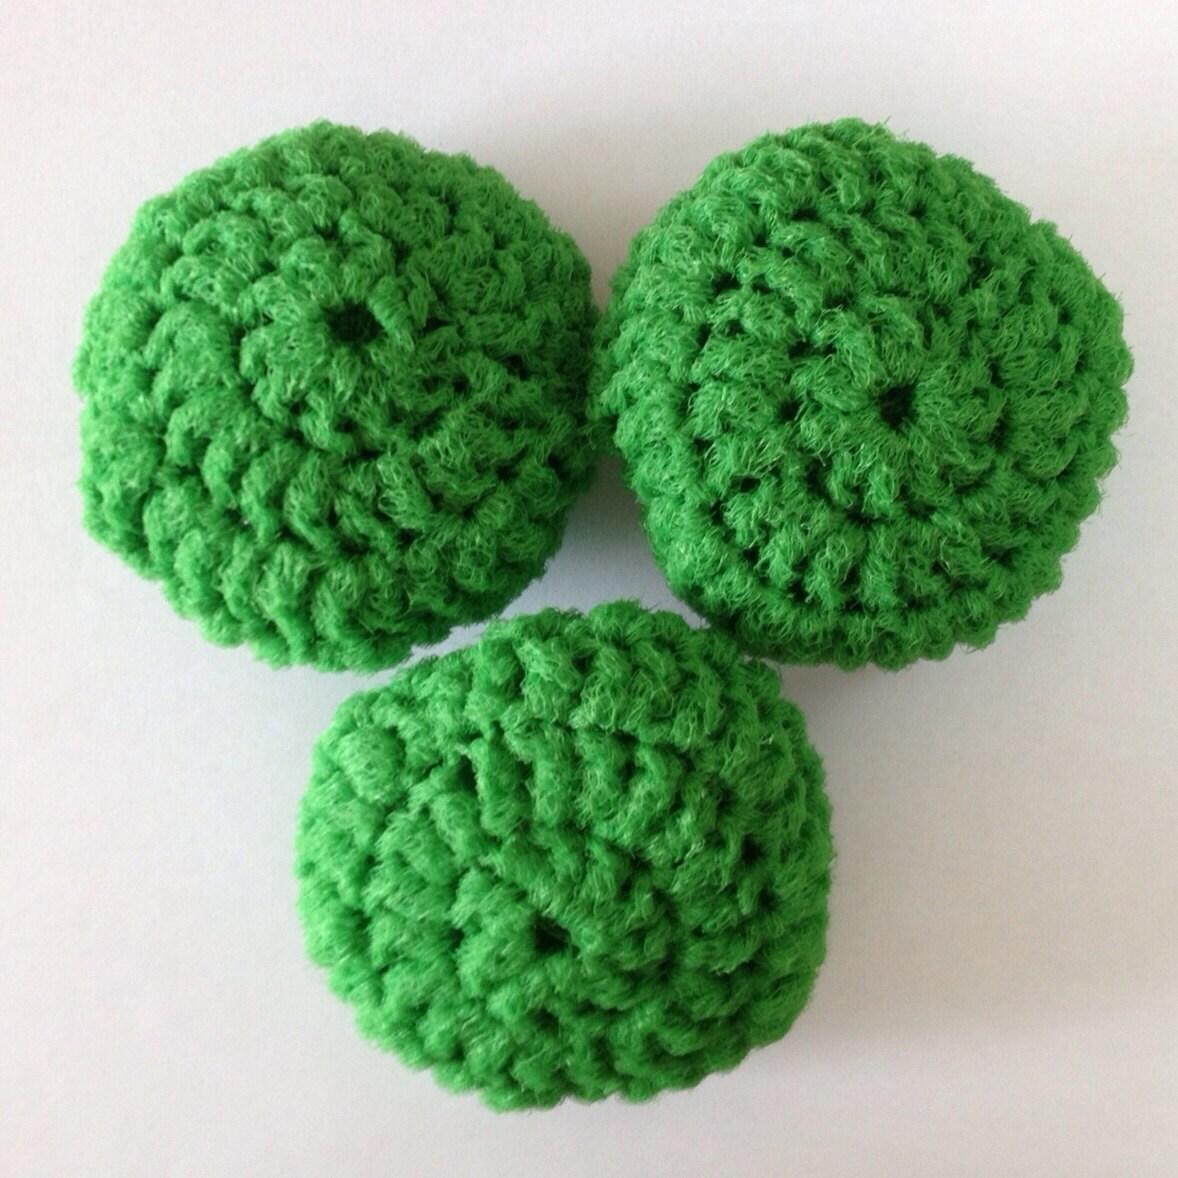 Green Nylon Net 21